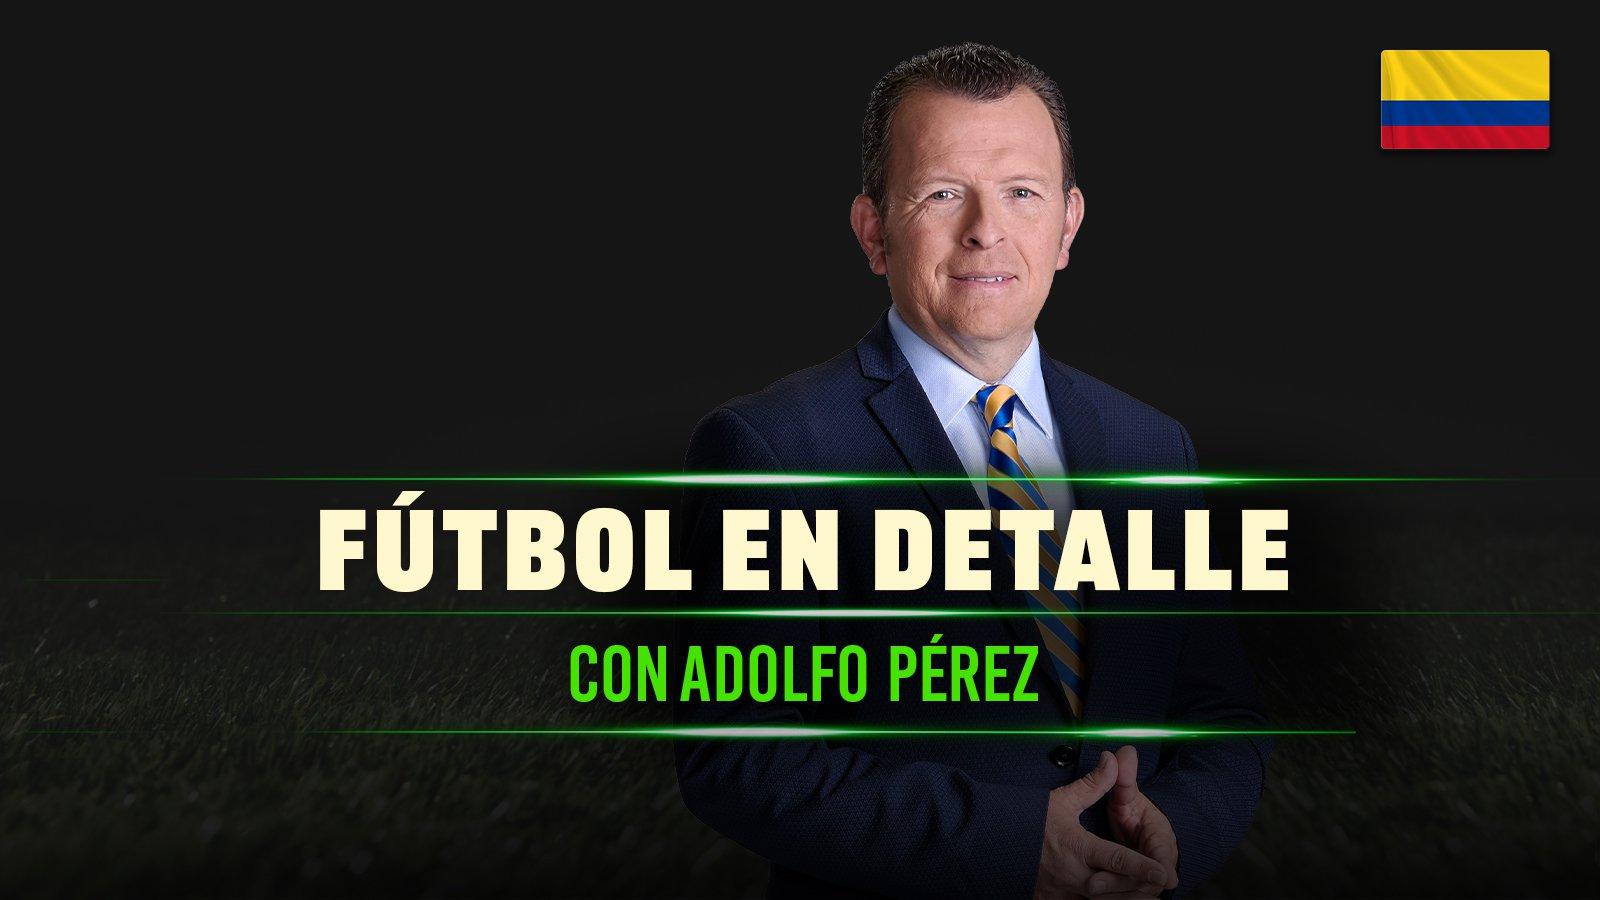 Fútbol En Detalle poster